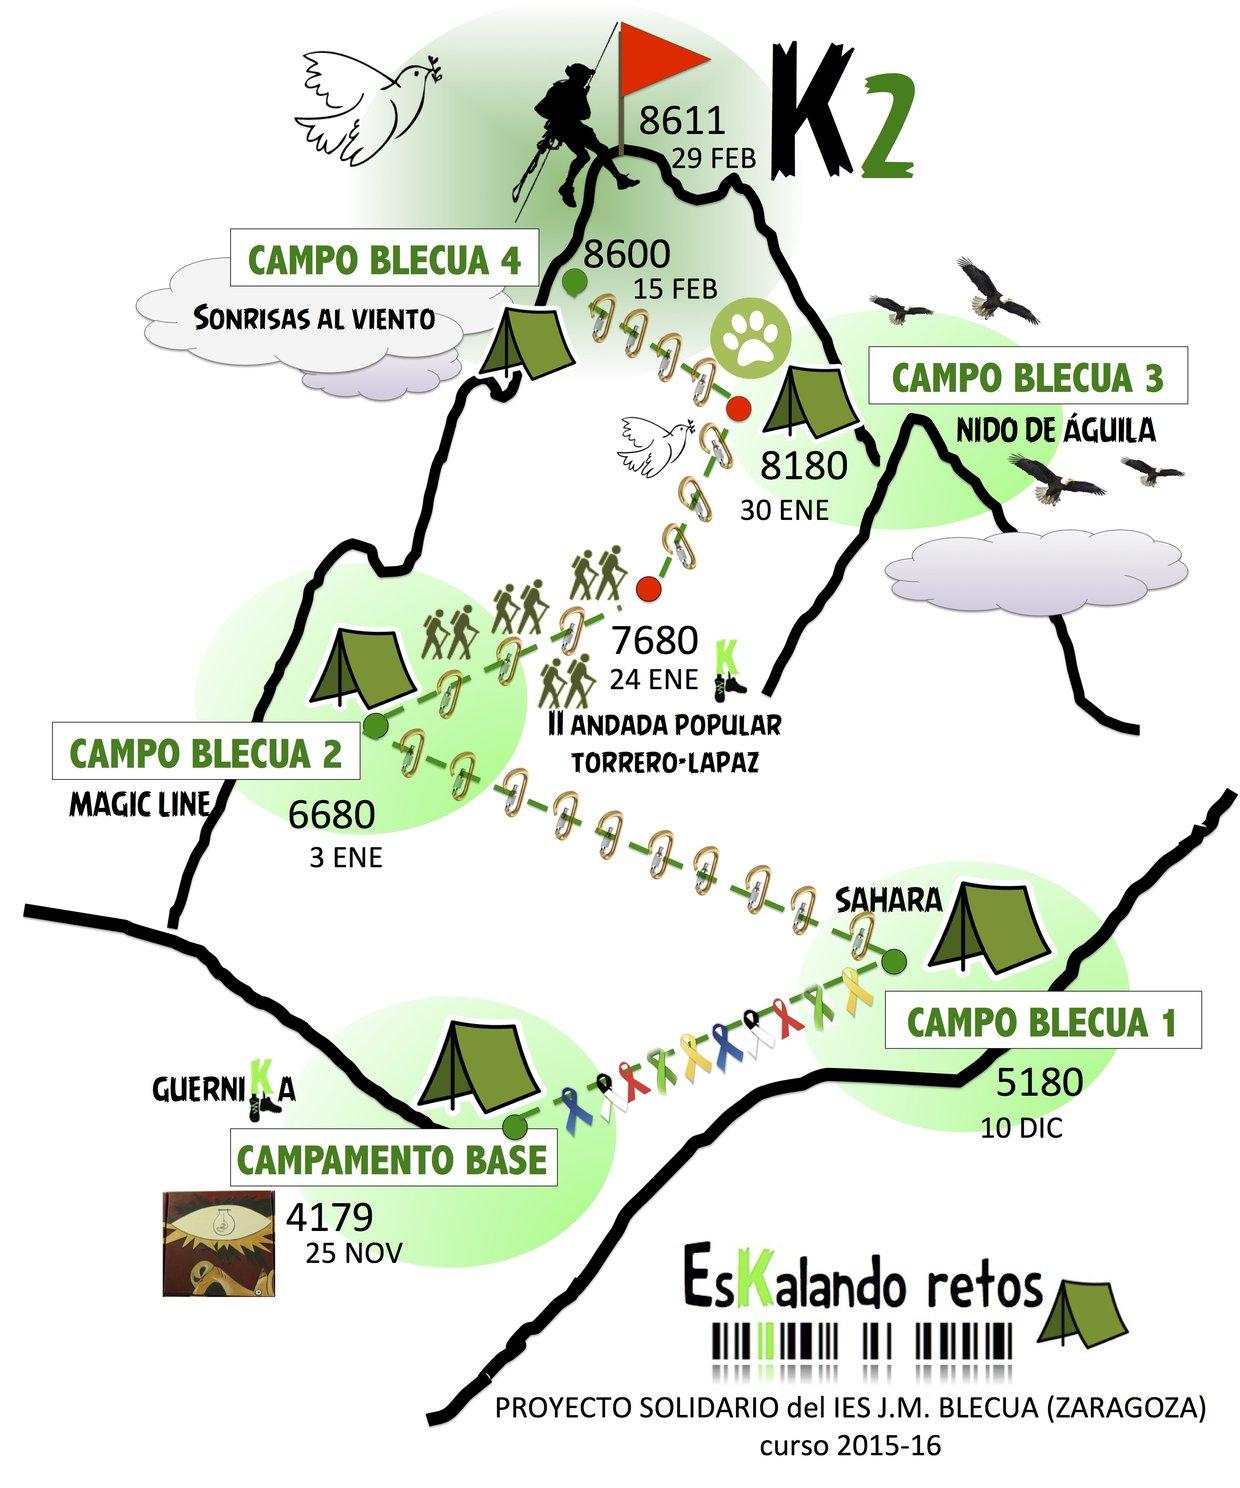 IMPLIK2_mapa actualizado enero 2016